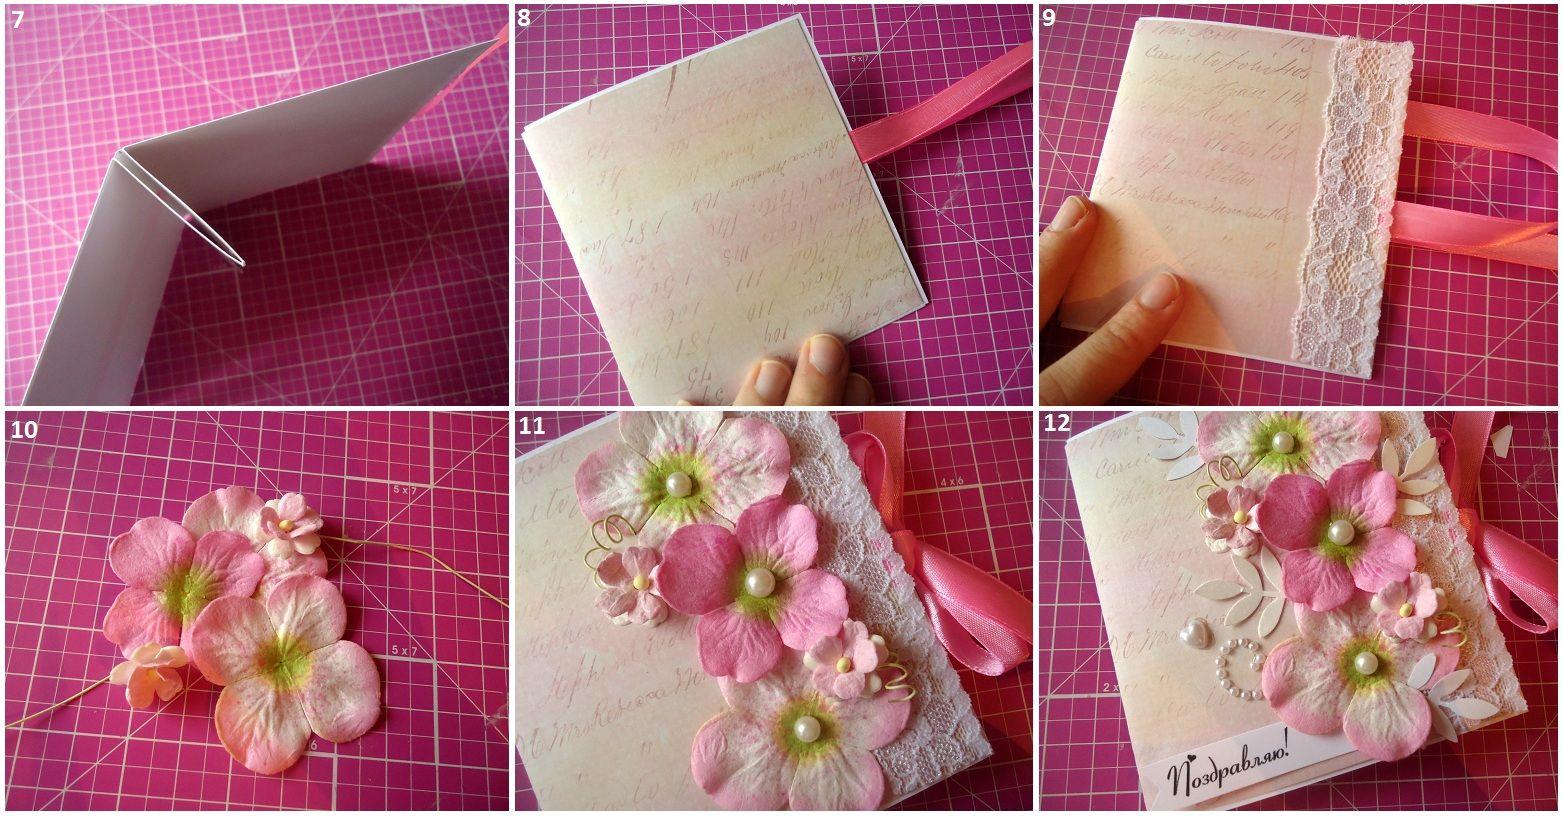 Курбан-байрам открытки, техника изготовления открыток скрапбукинг